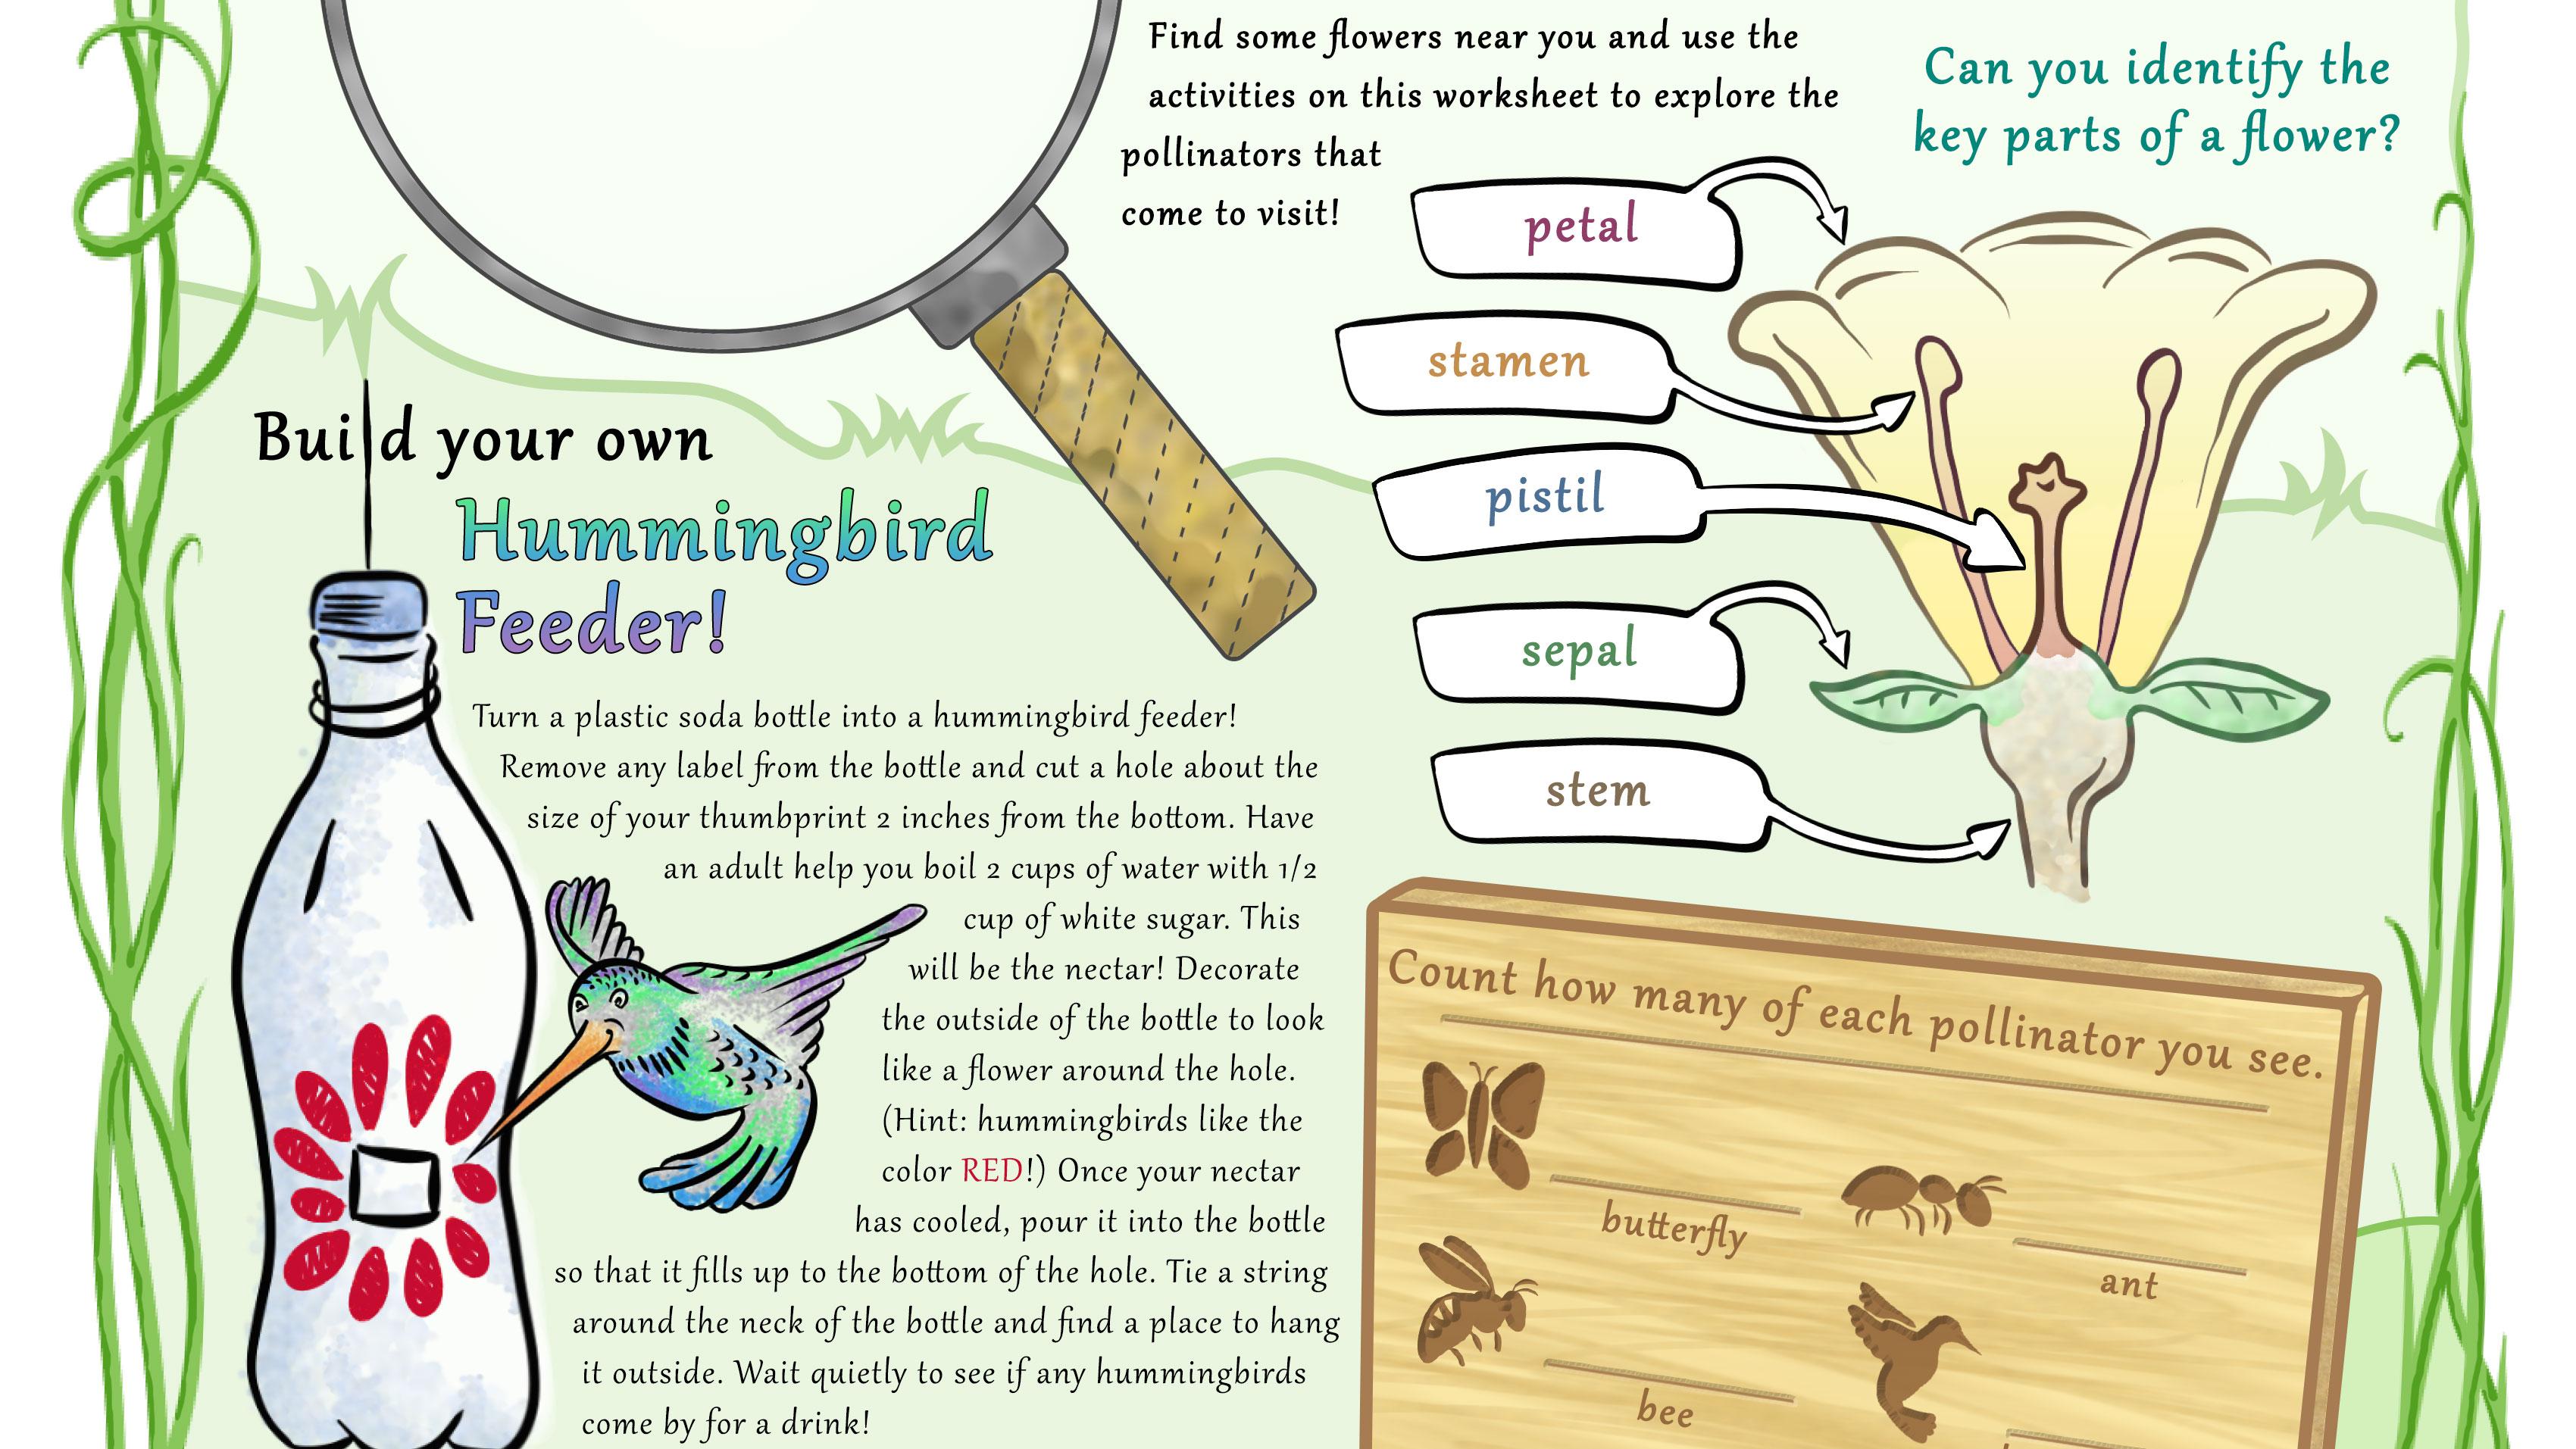 Pollinator Backyard Activity Guide – Pollination Worksheet